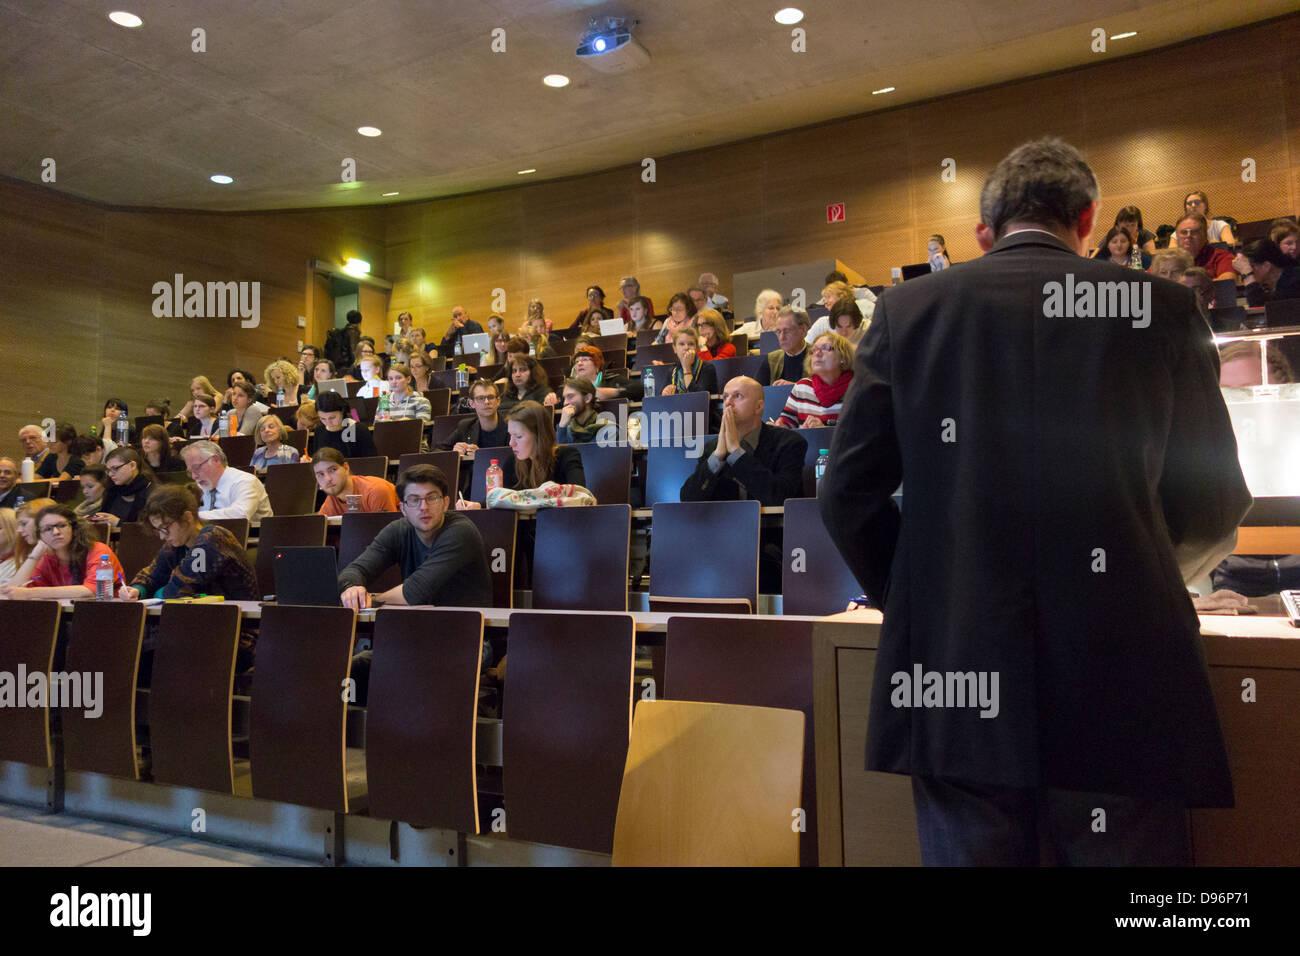 Professor lecturing at Vienna University, Austria - Stock Image